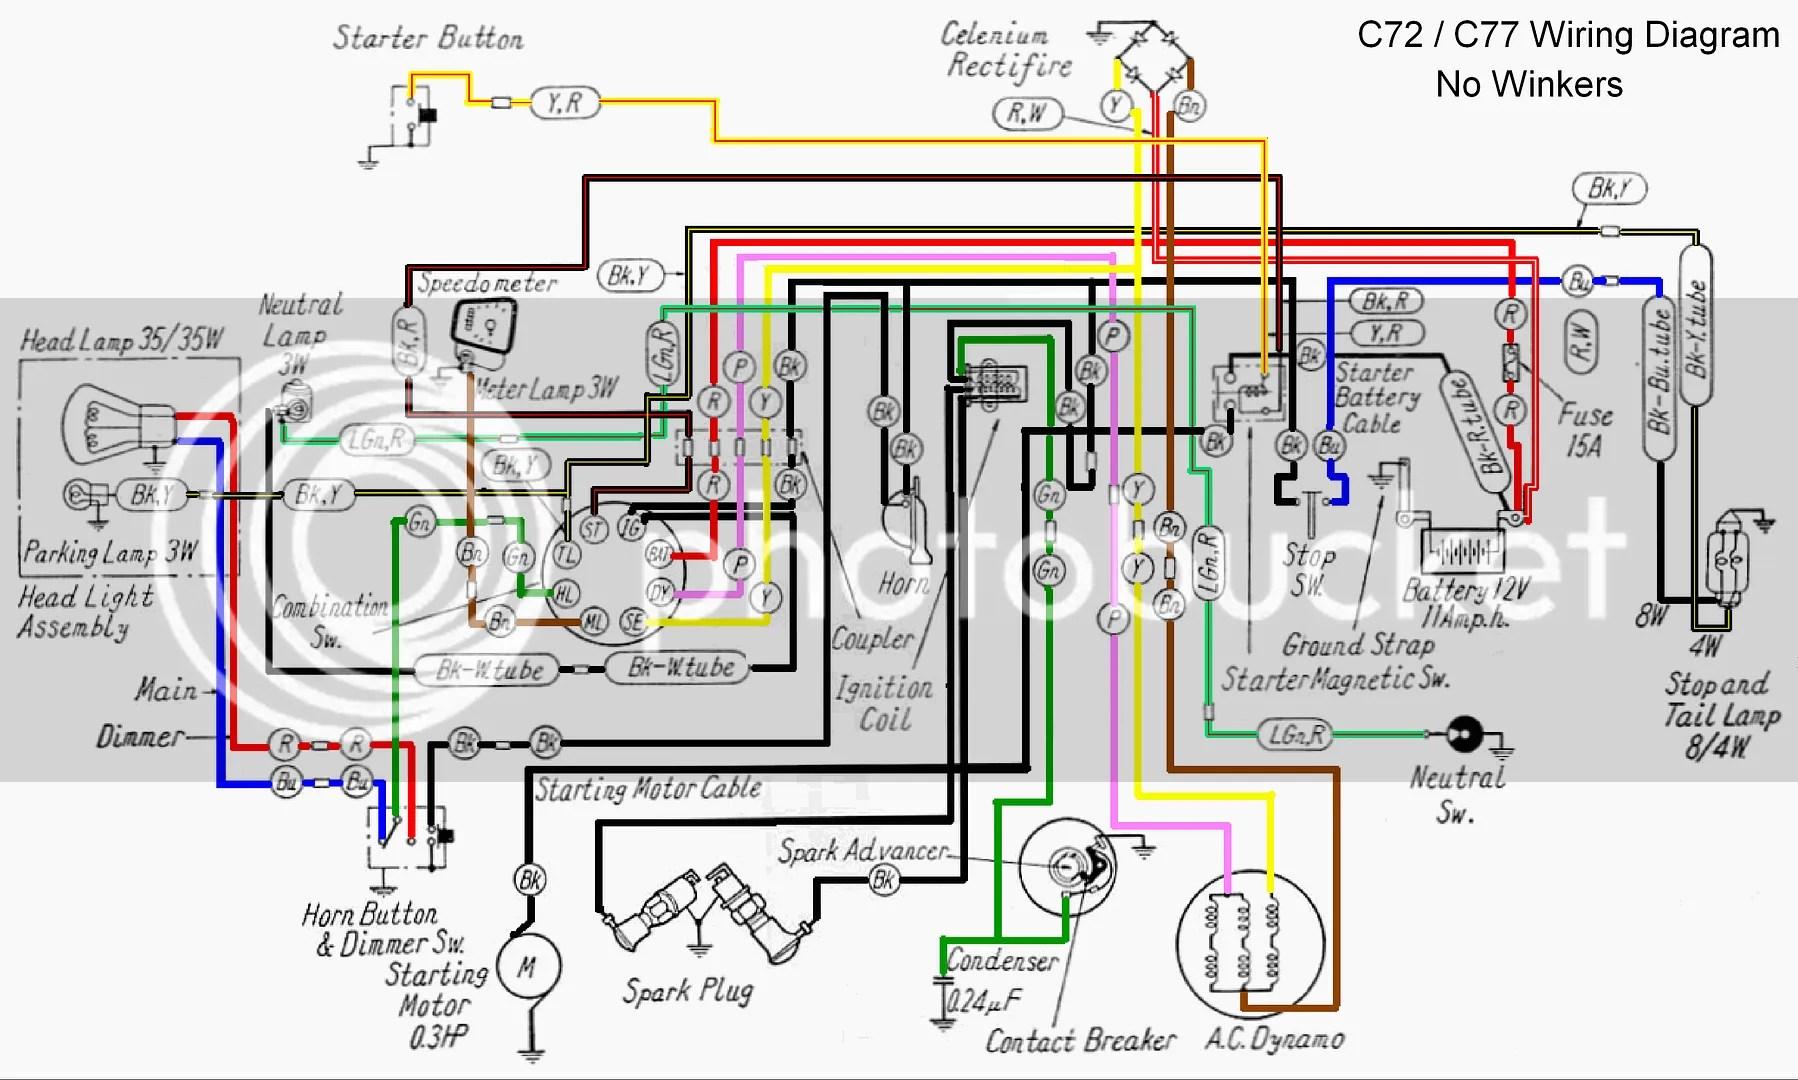 1969 cb175 wiring diagram wiring diagram article review [ 1798 x 1080 Pixel ]